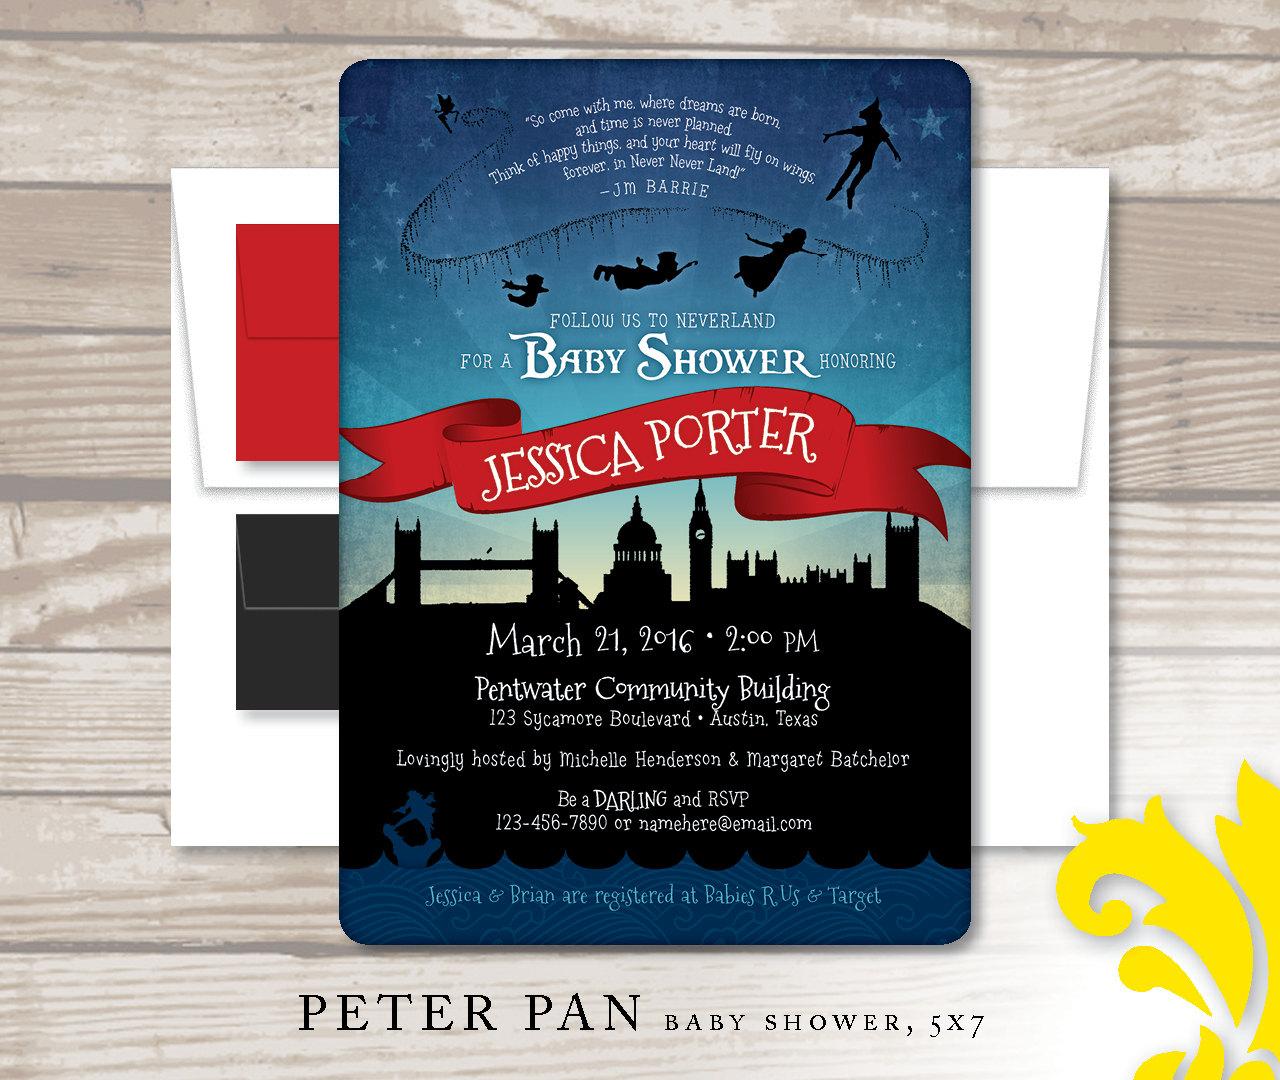 Dorable Peter Pan Birthday Invitation Image - Invitations and ...